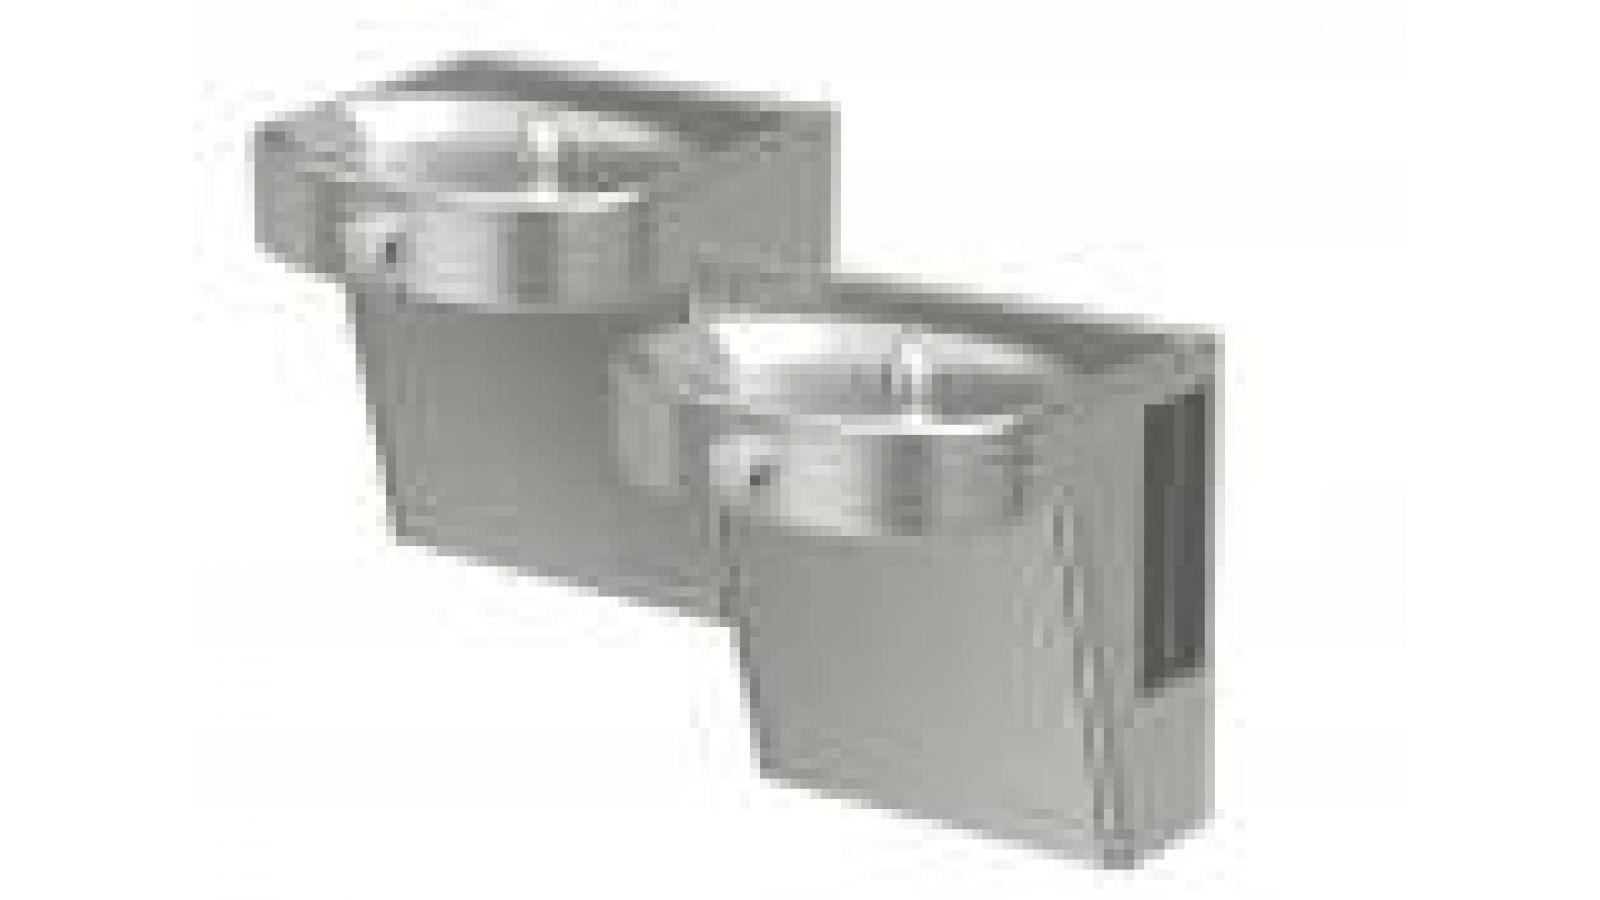 Halsey Taylor 14 GA Vandal-resistant Water Cooler